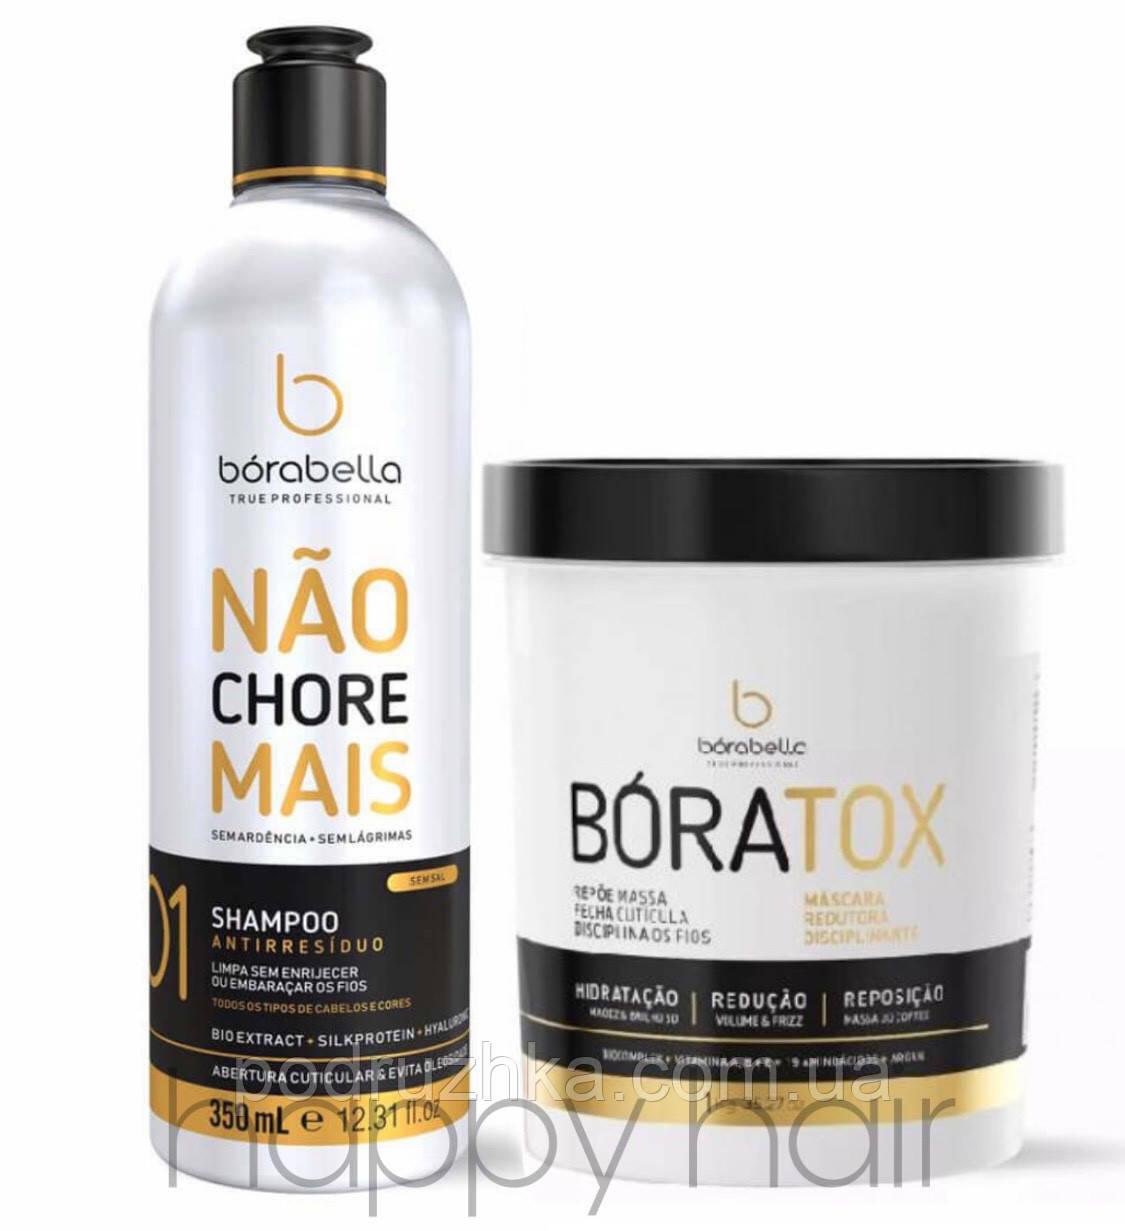 Borabella Organic Boratox Набор ботокс для волос 2х1000 г